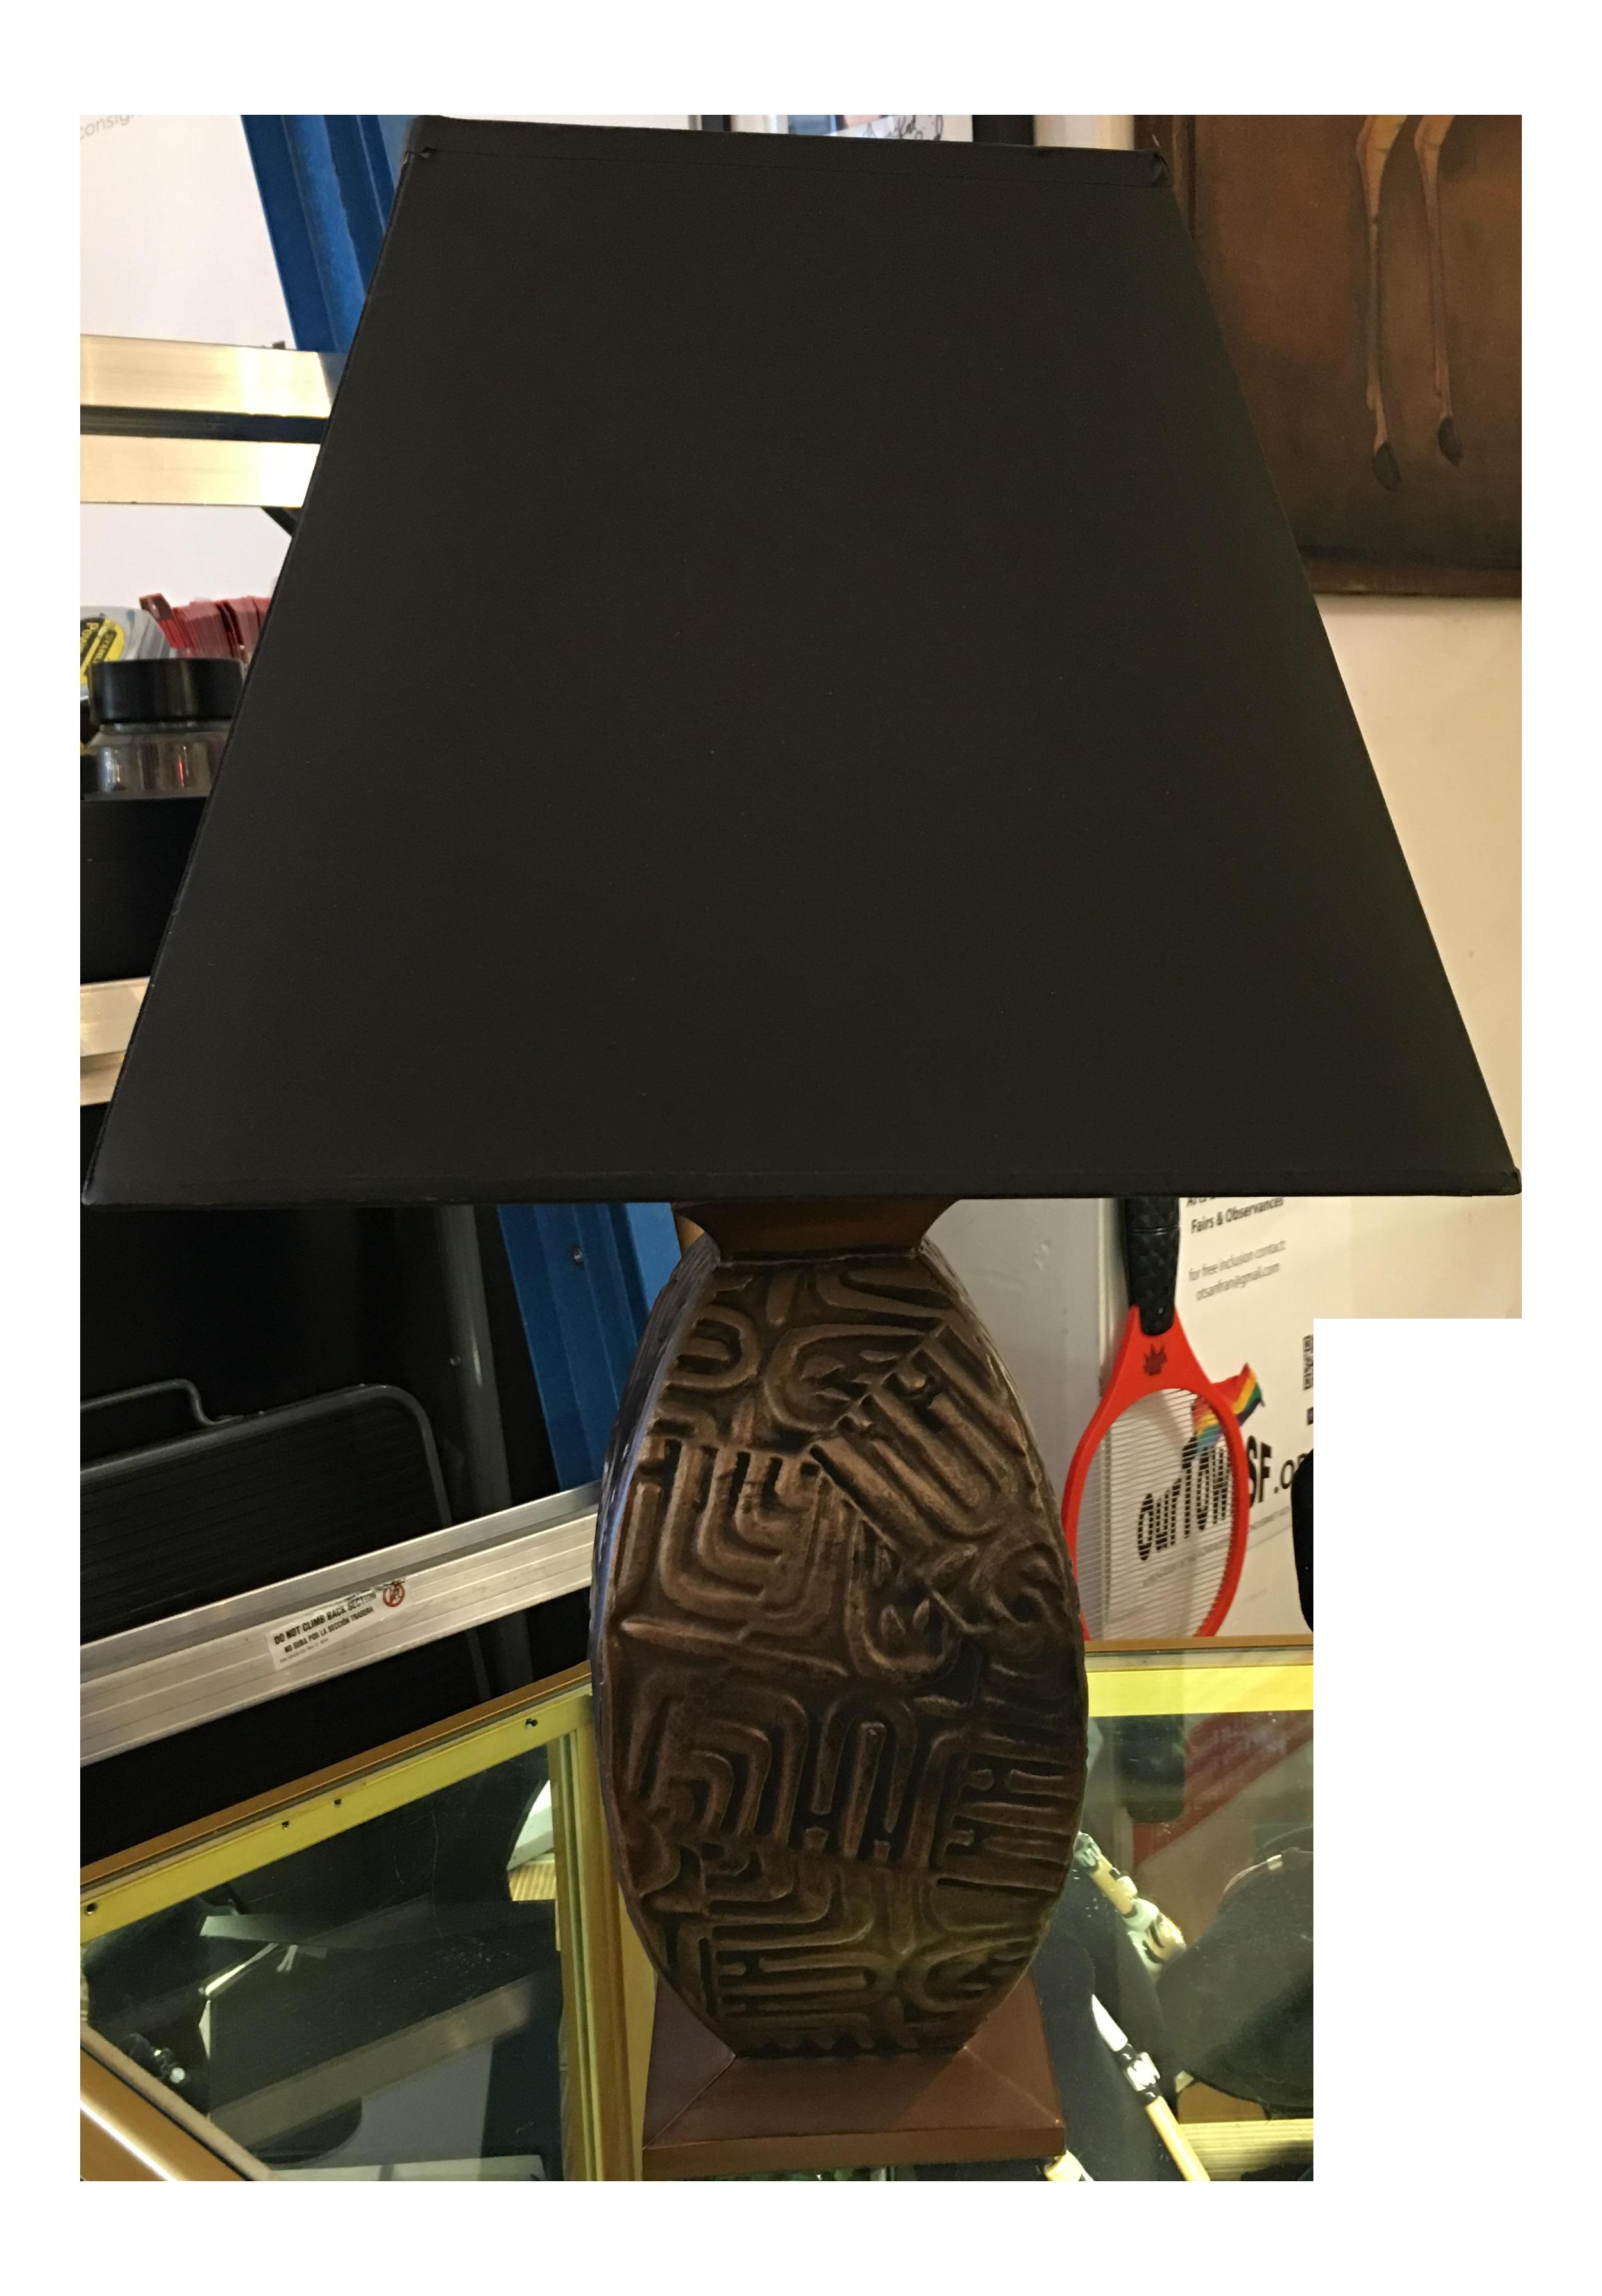 Gumps metal base table lamp